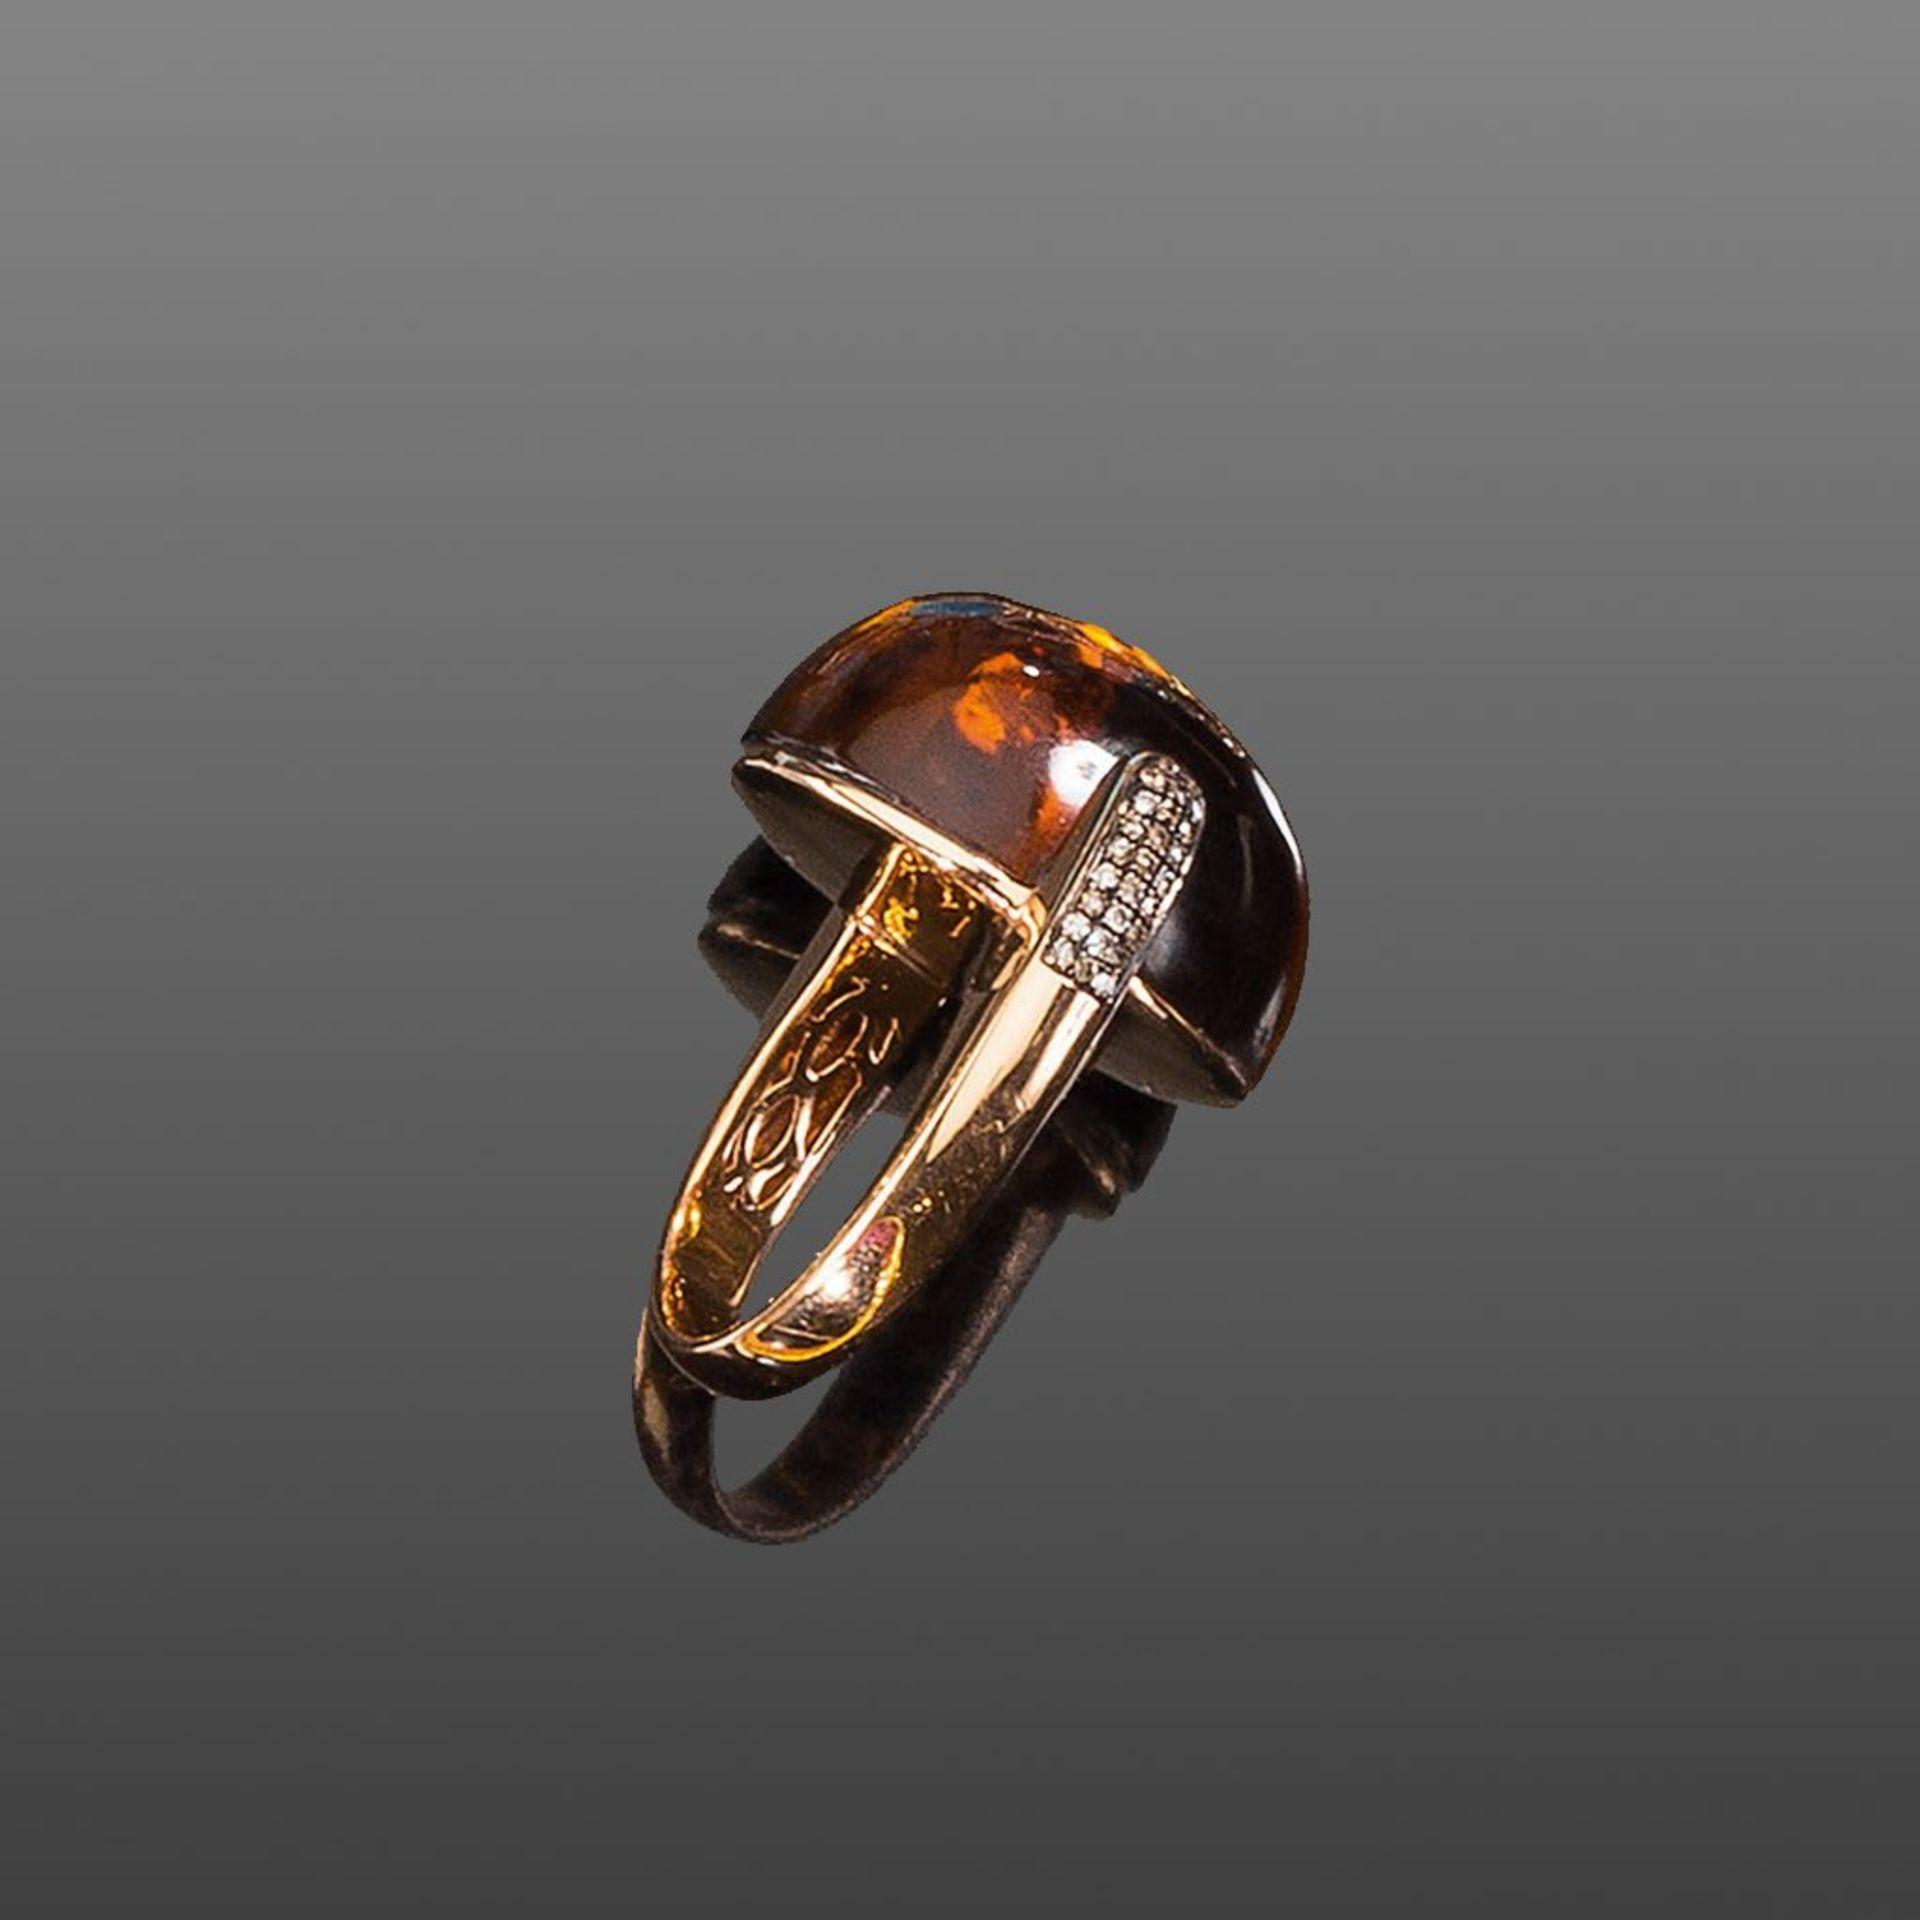 Citrin-/Diamantring. Großer Citrincabochon ca. 42,95 ct. Braune Diamanten ca. 0,25 ct. Fassung 18